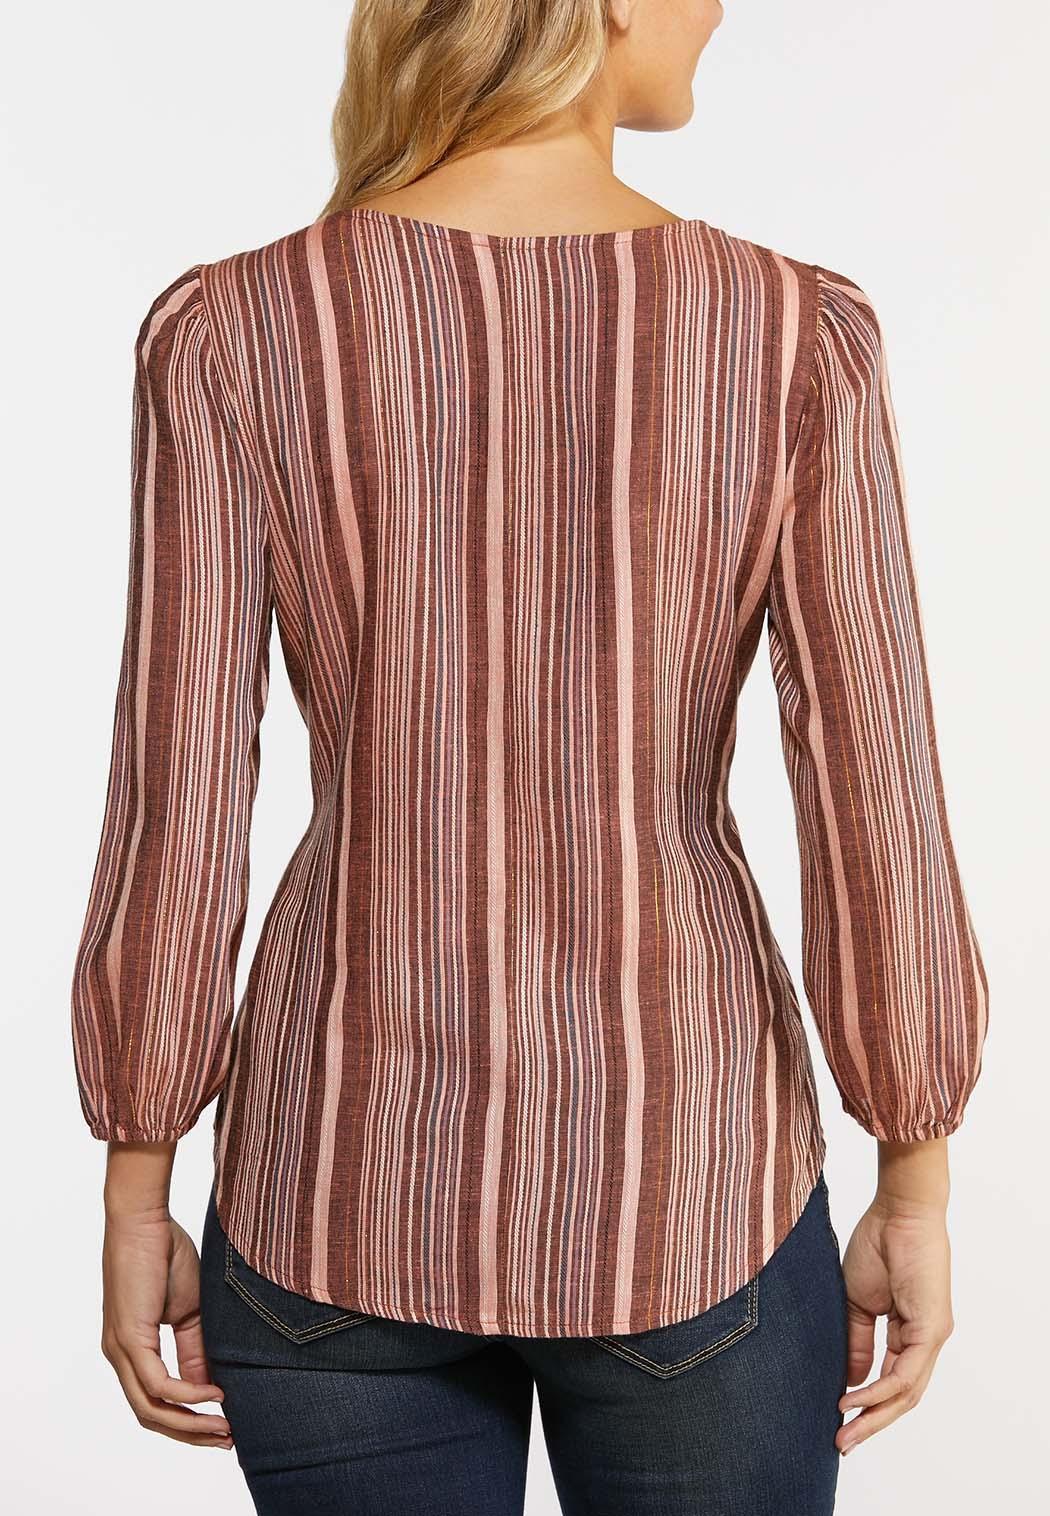 Belted Stripe Top (Item #44328720)